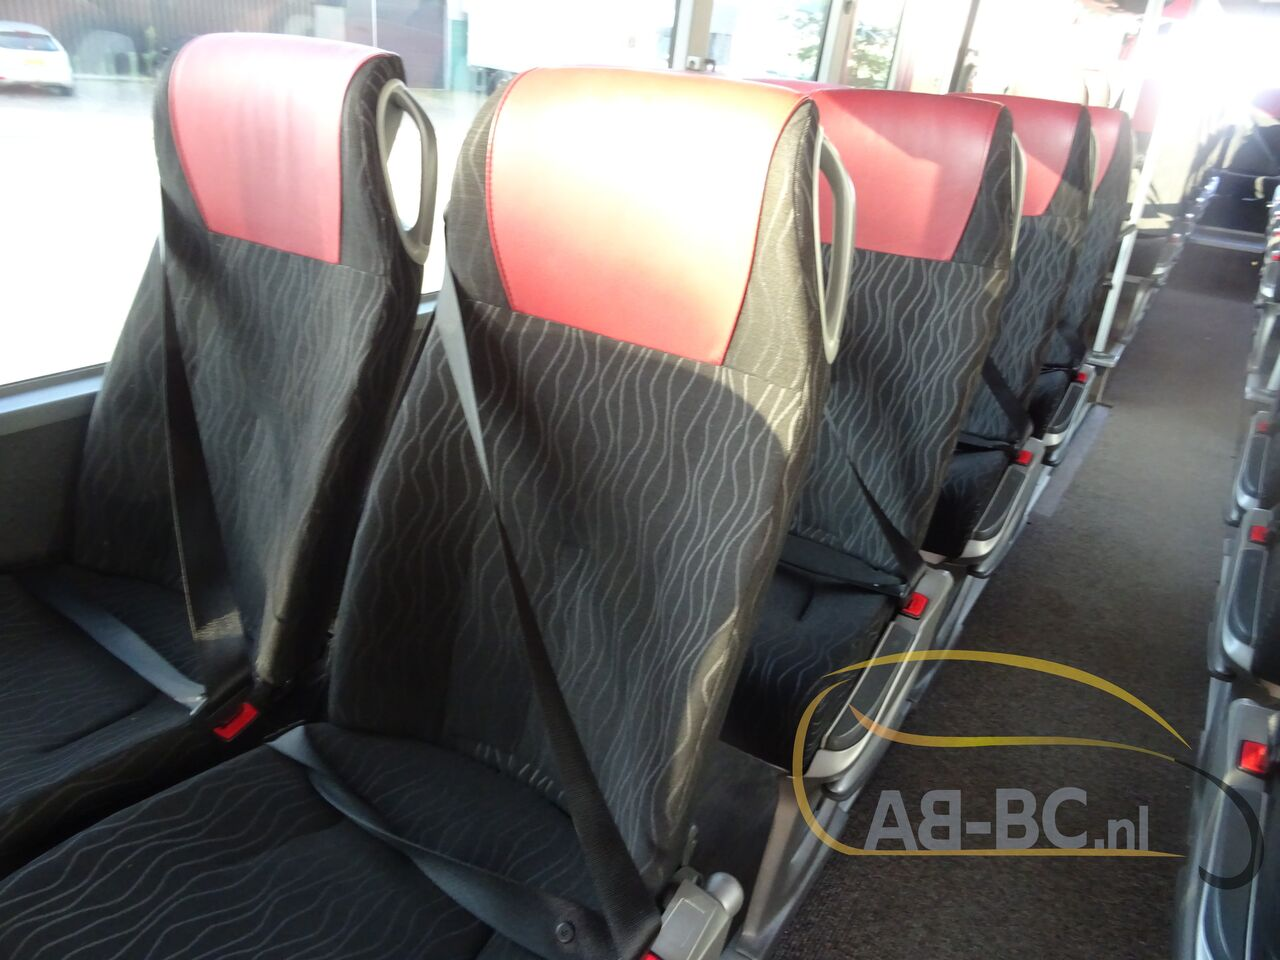 coach-bus-SETRA-S415H-52-Seats-EURO-6-Liftbus---1630913417771305351_big_6aad6e8ee35c6c522340f413e1a9876c--21070517141280735500